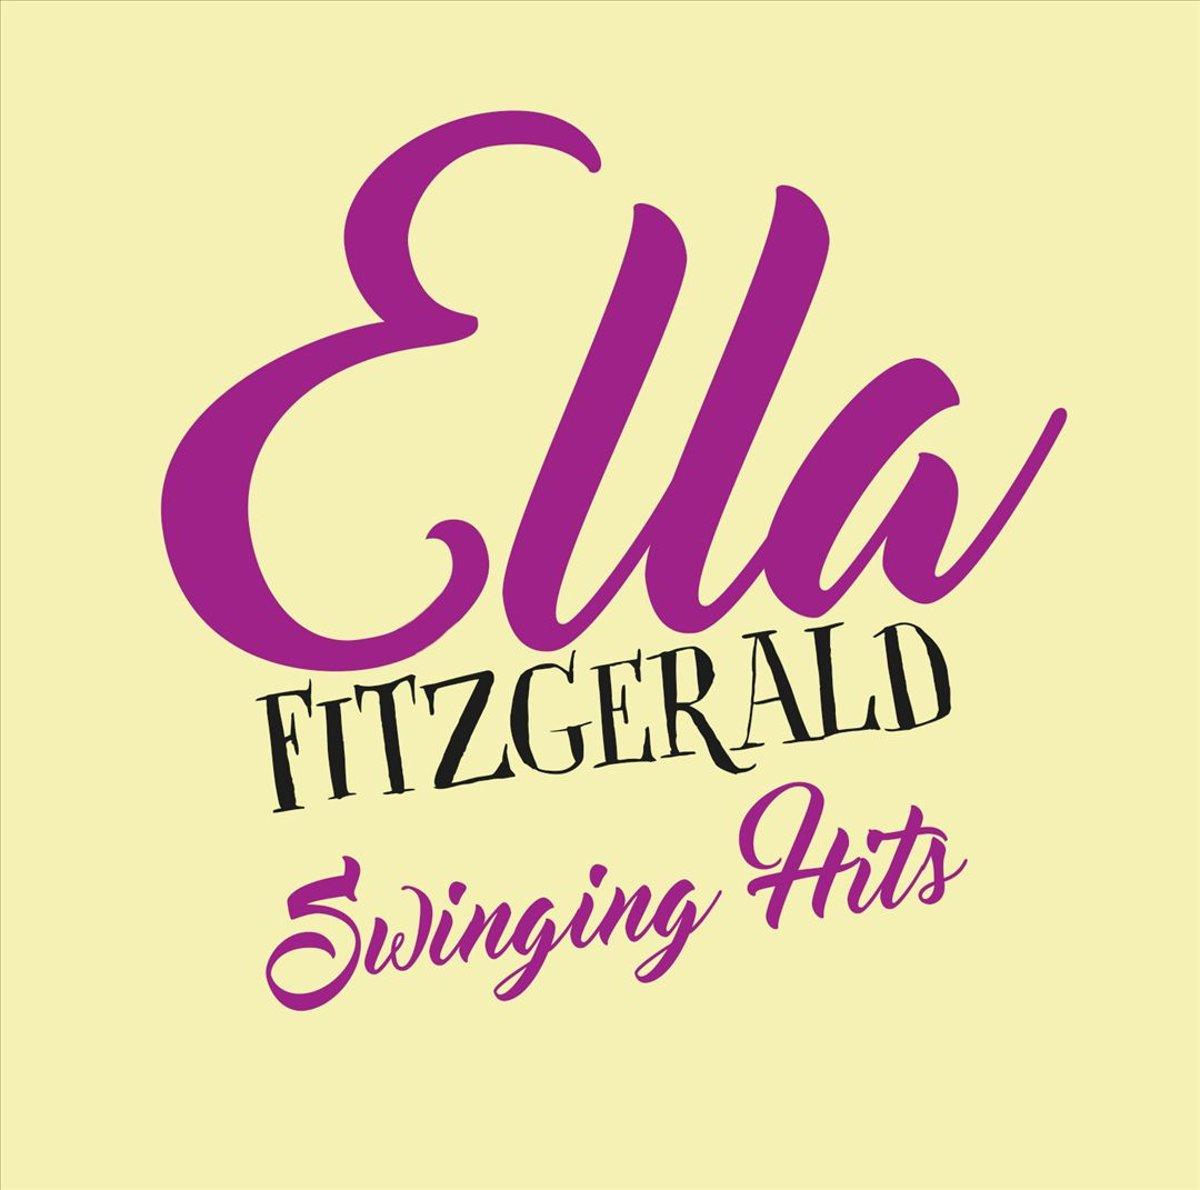 цена Элла Фитцжеральд Ella Fitzgerald. Swinging Hits (3 CD) в интернет-магазинах